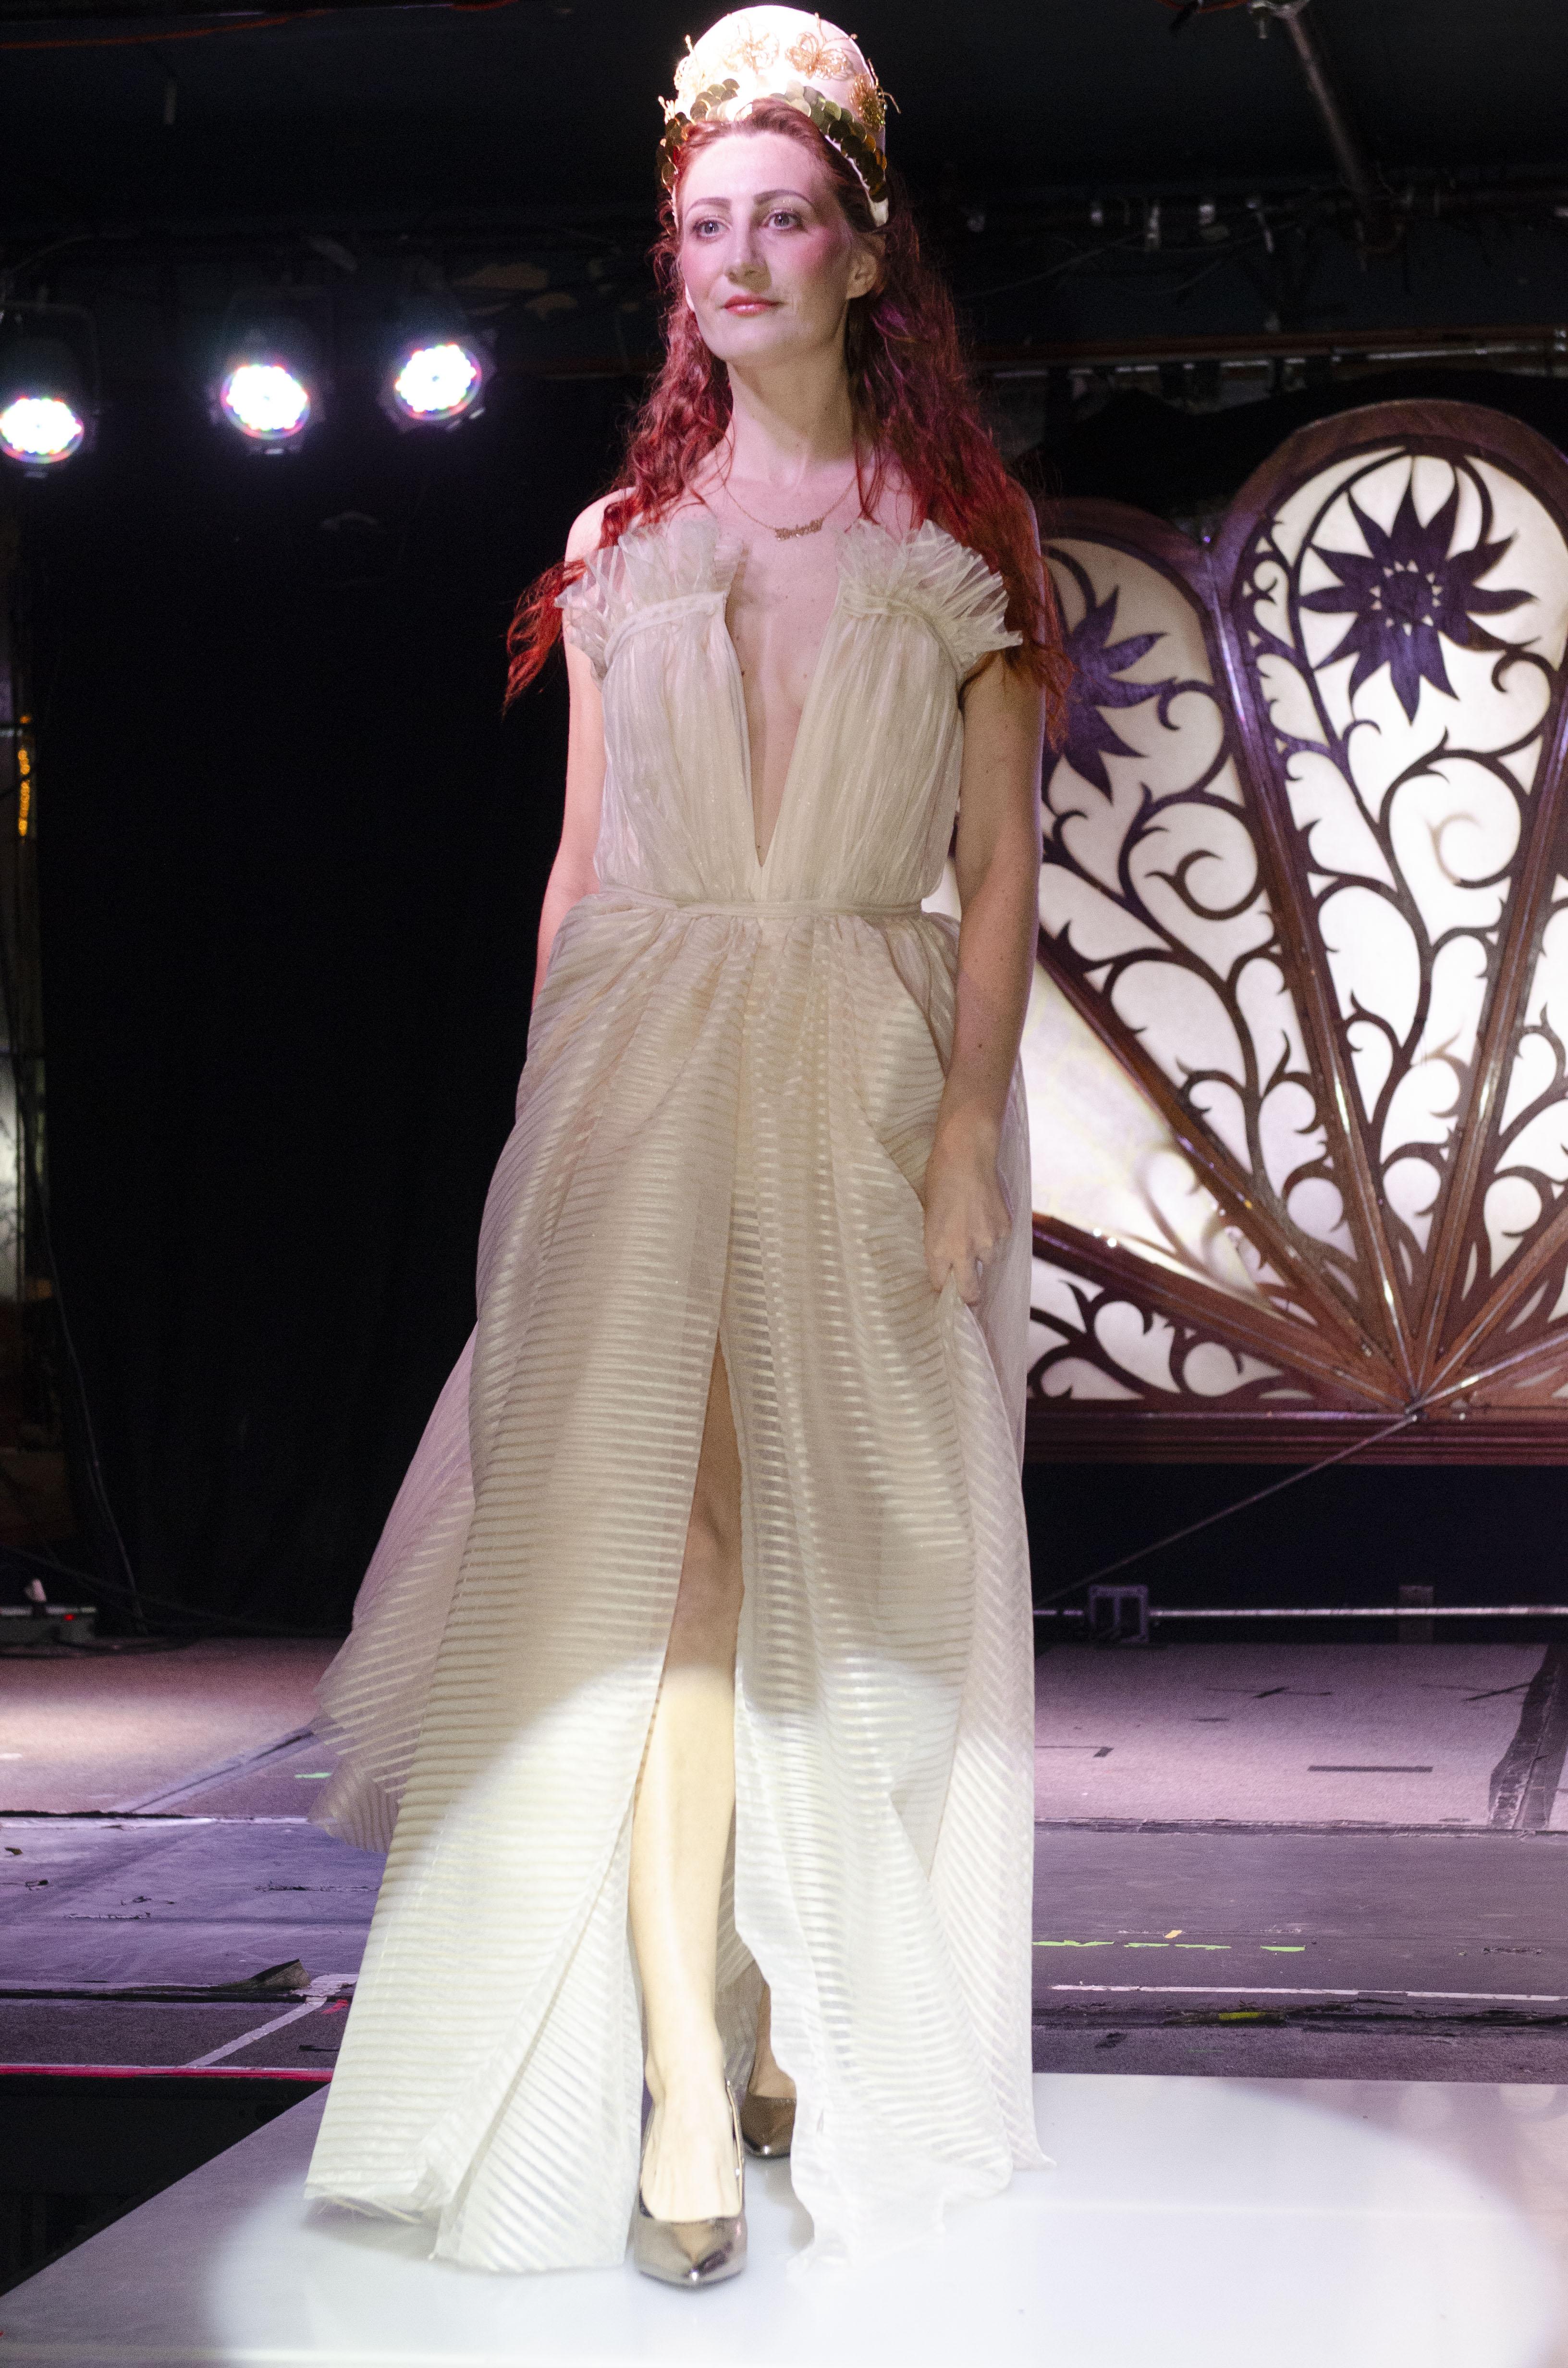 Kimberly Princess